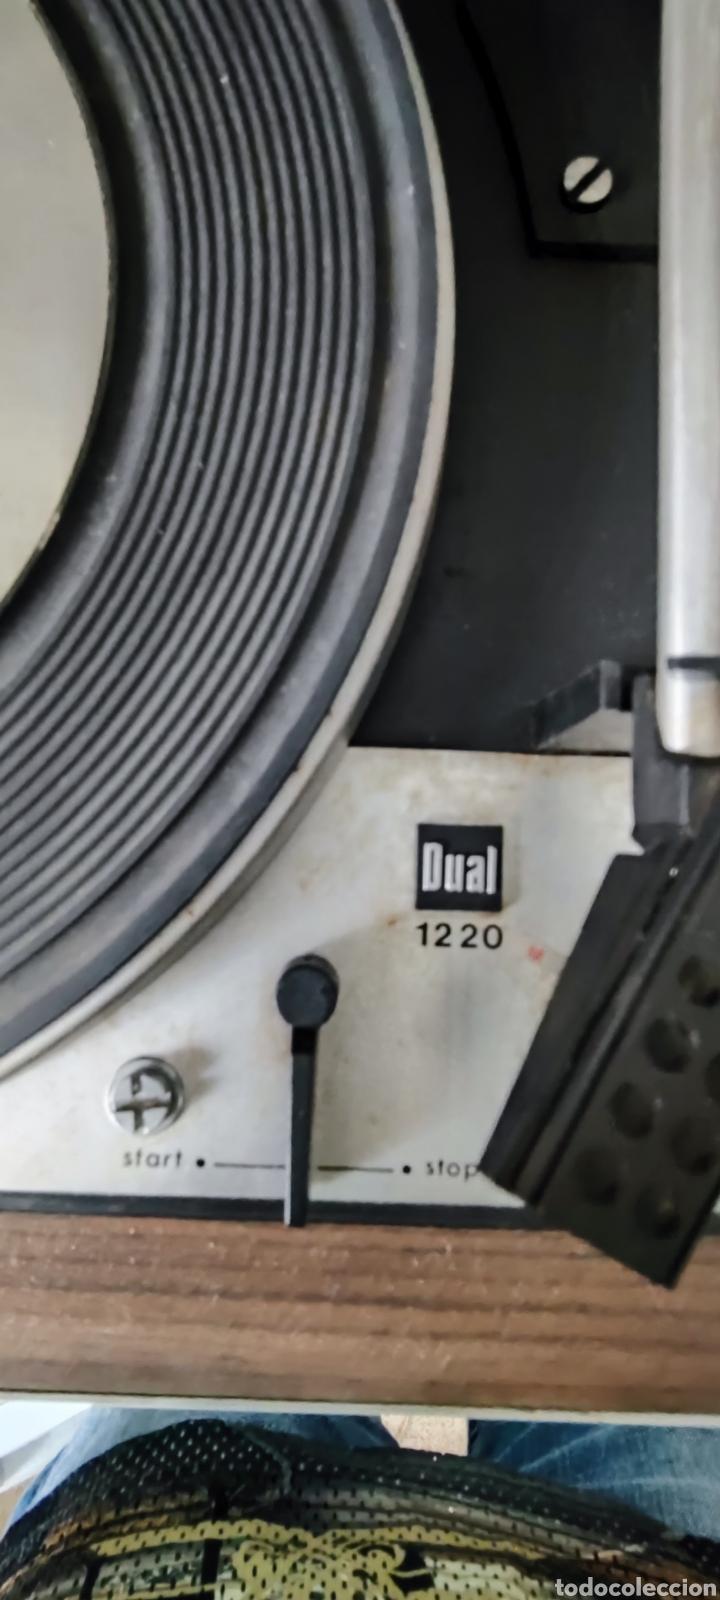 Radios antiguas: Radio Tocadiscos Bettor , Dual12 20 - Foto 7 - 284277578